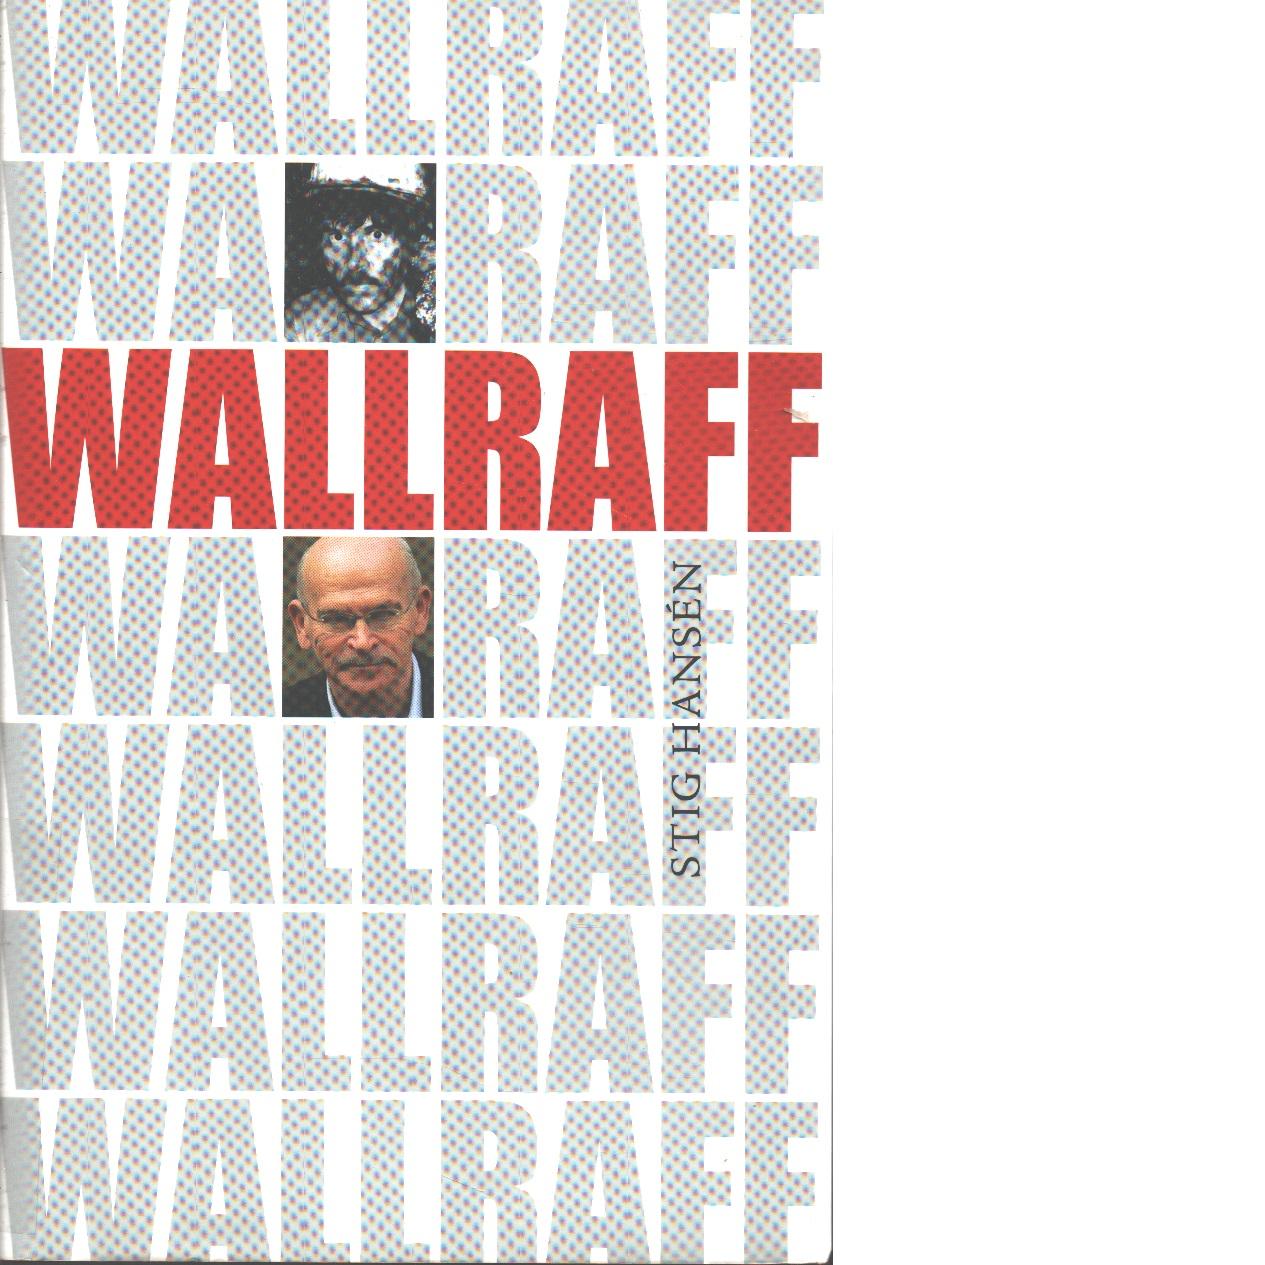 Wallraff - Hansén, Stig